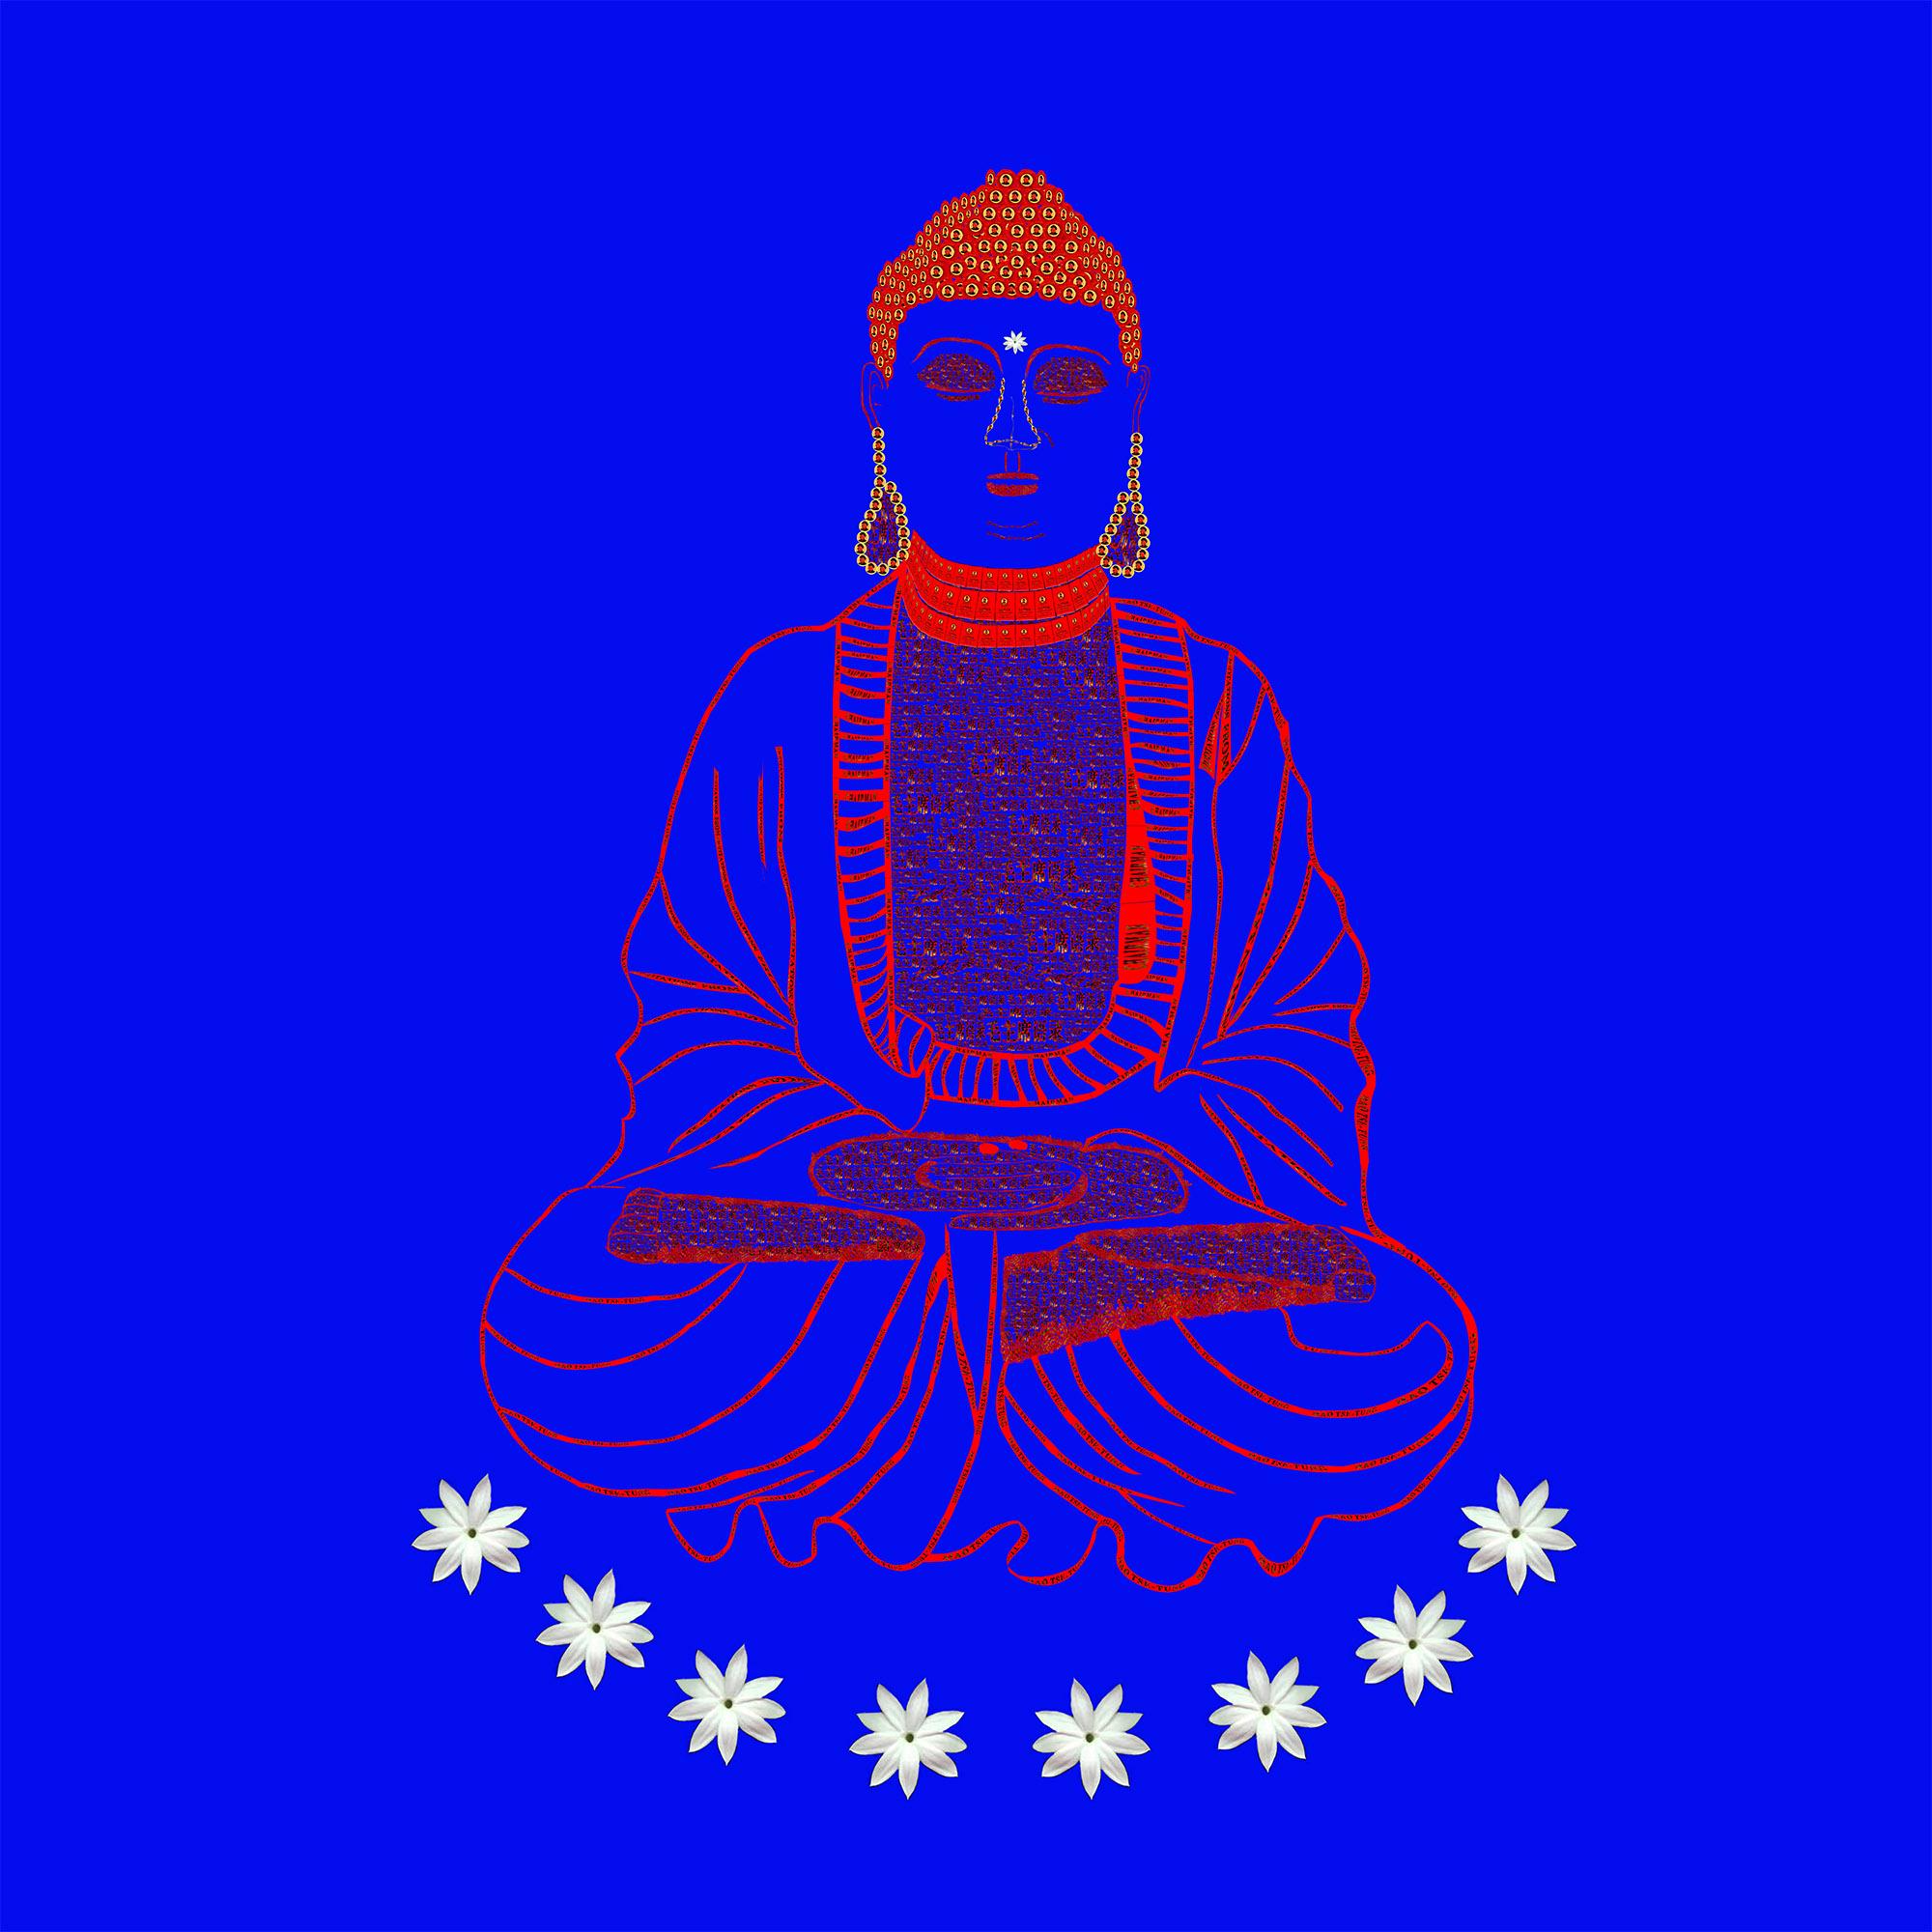 Red Book Buddha - Blue